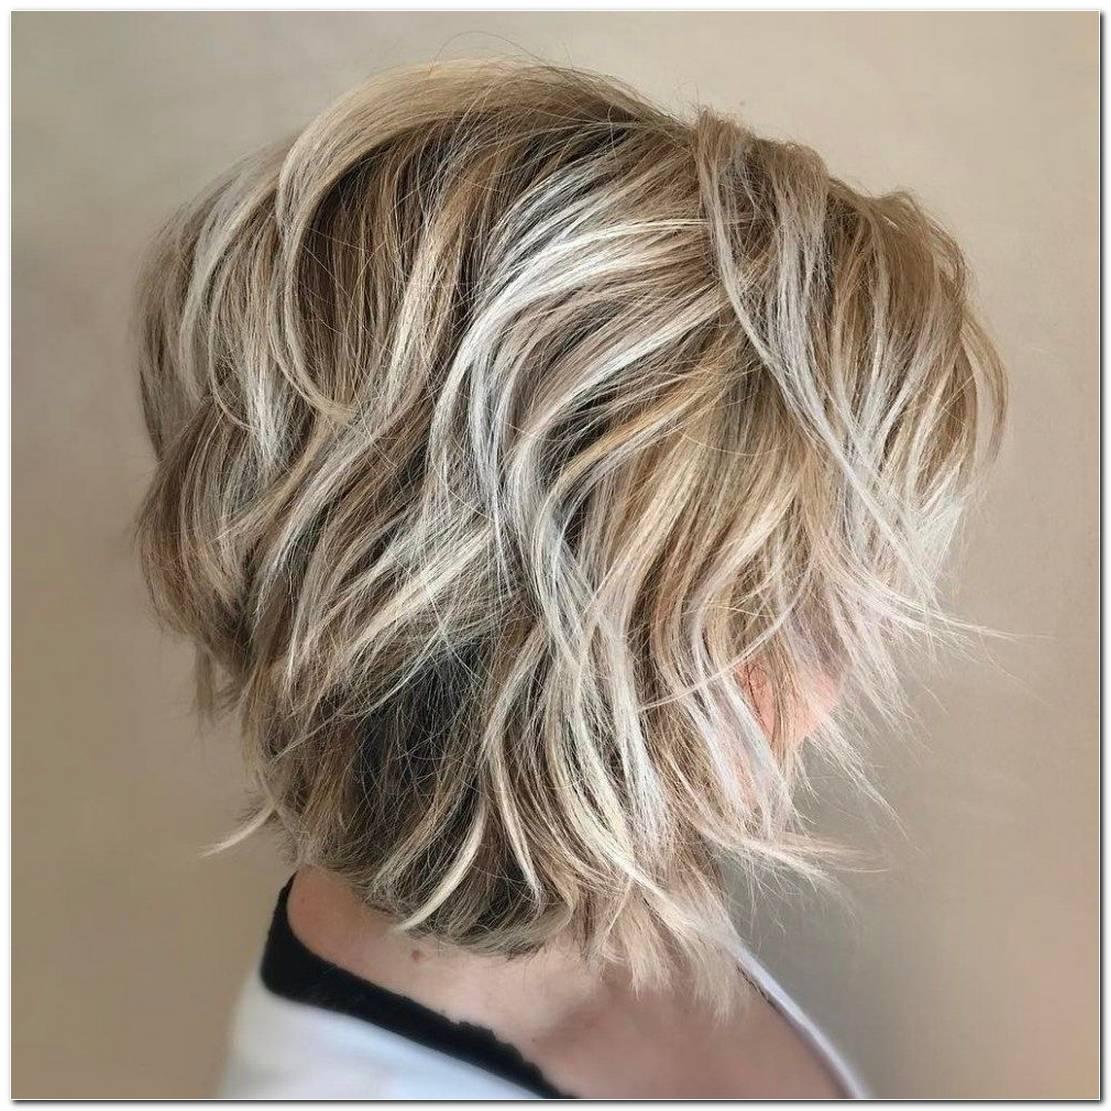 Blonde Bob Frisuren Bilder